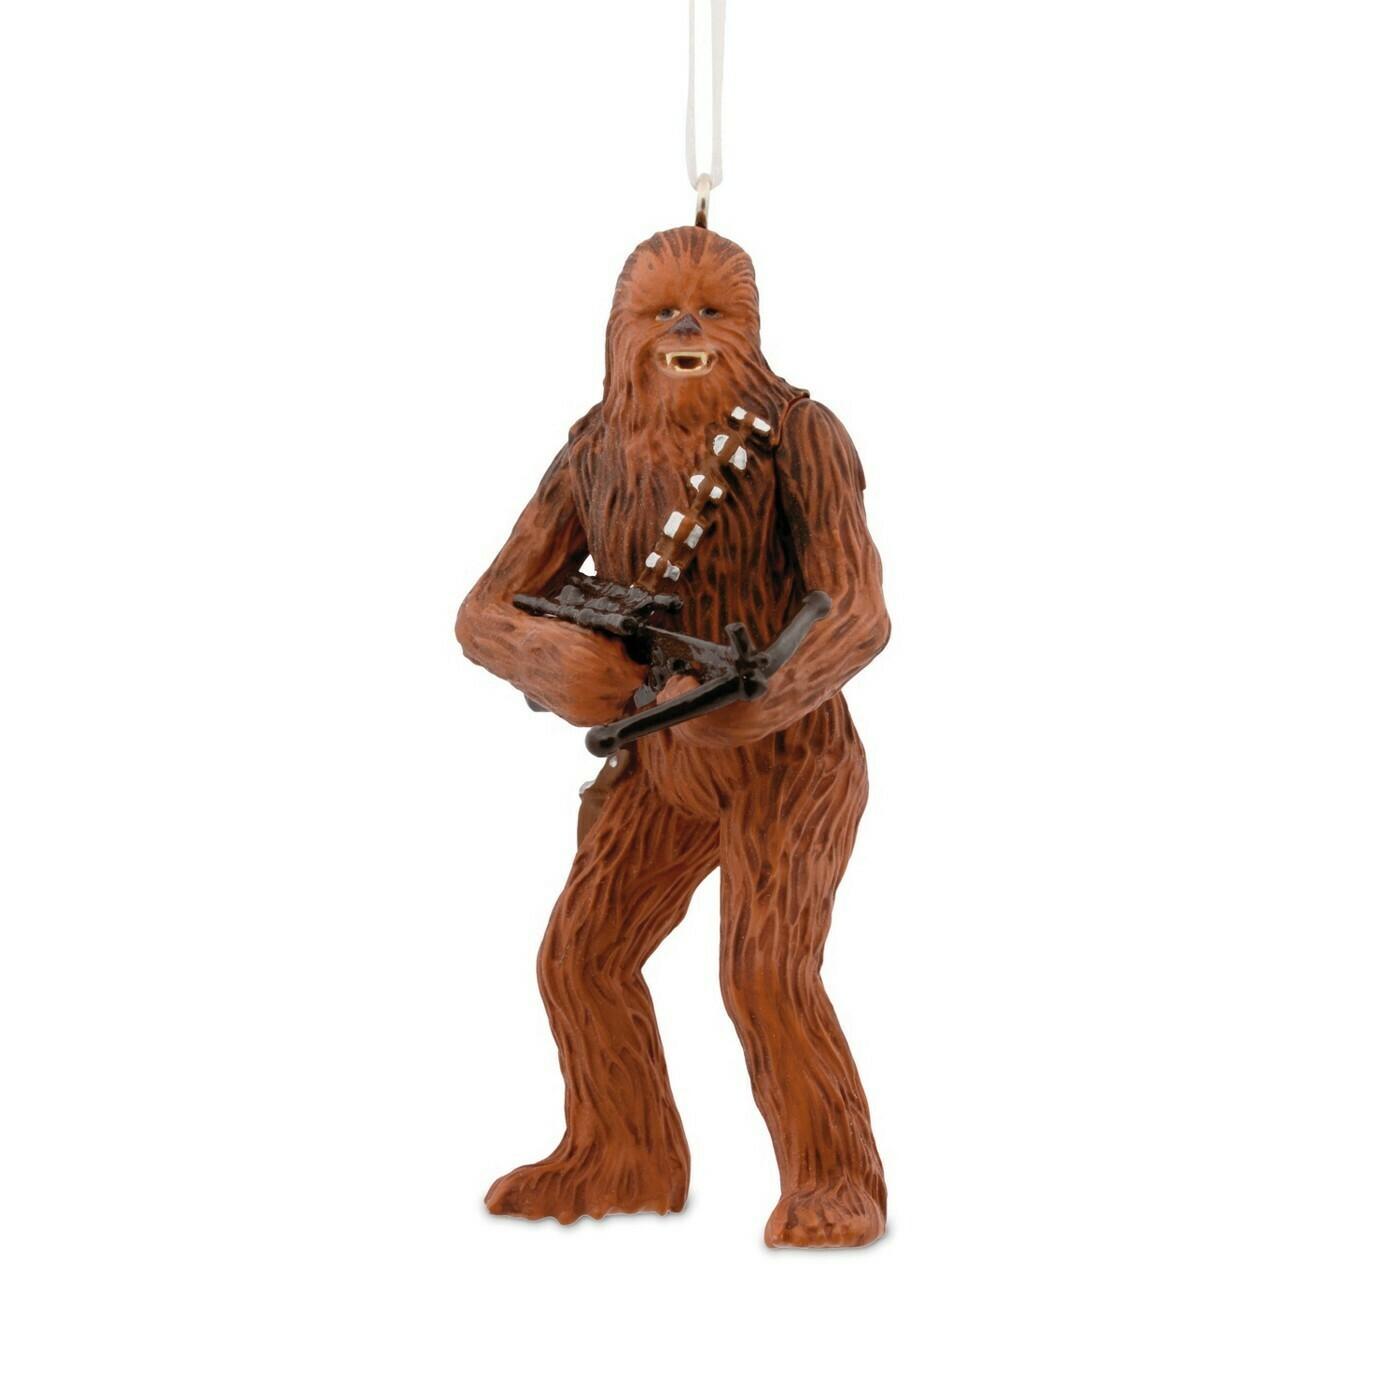 Chewbacca Star Wars Hallmark Christmas Tree Holiday Ornament